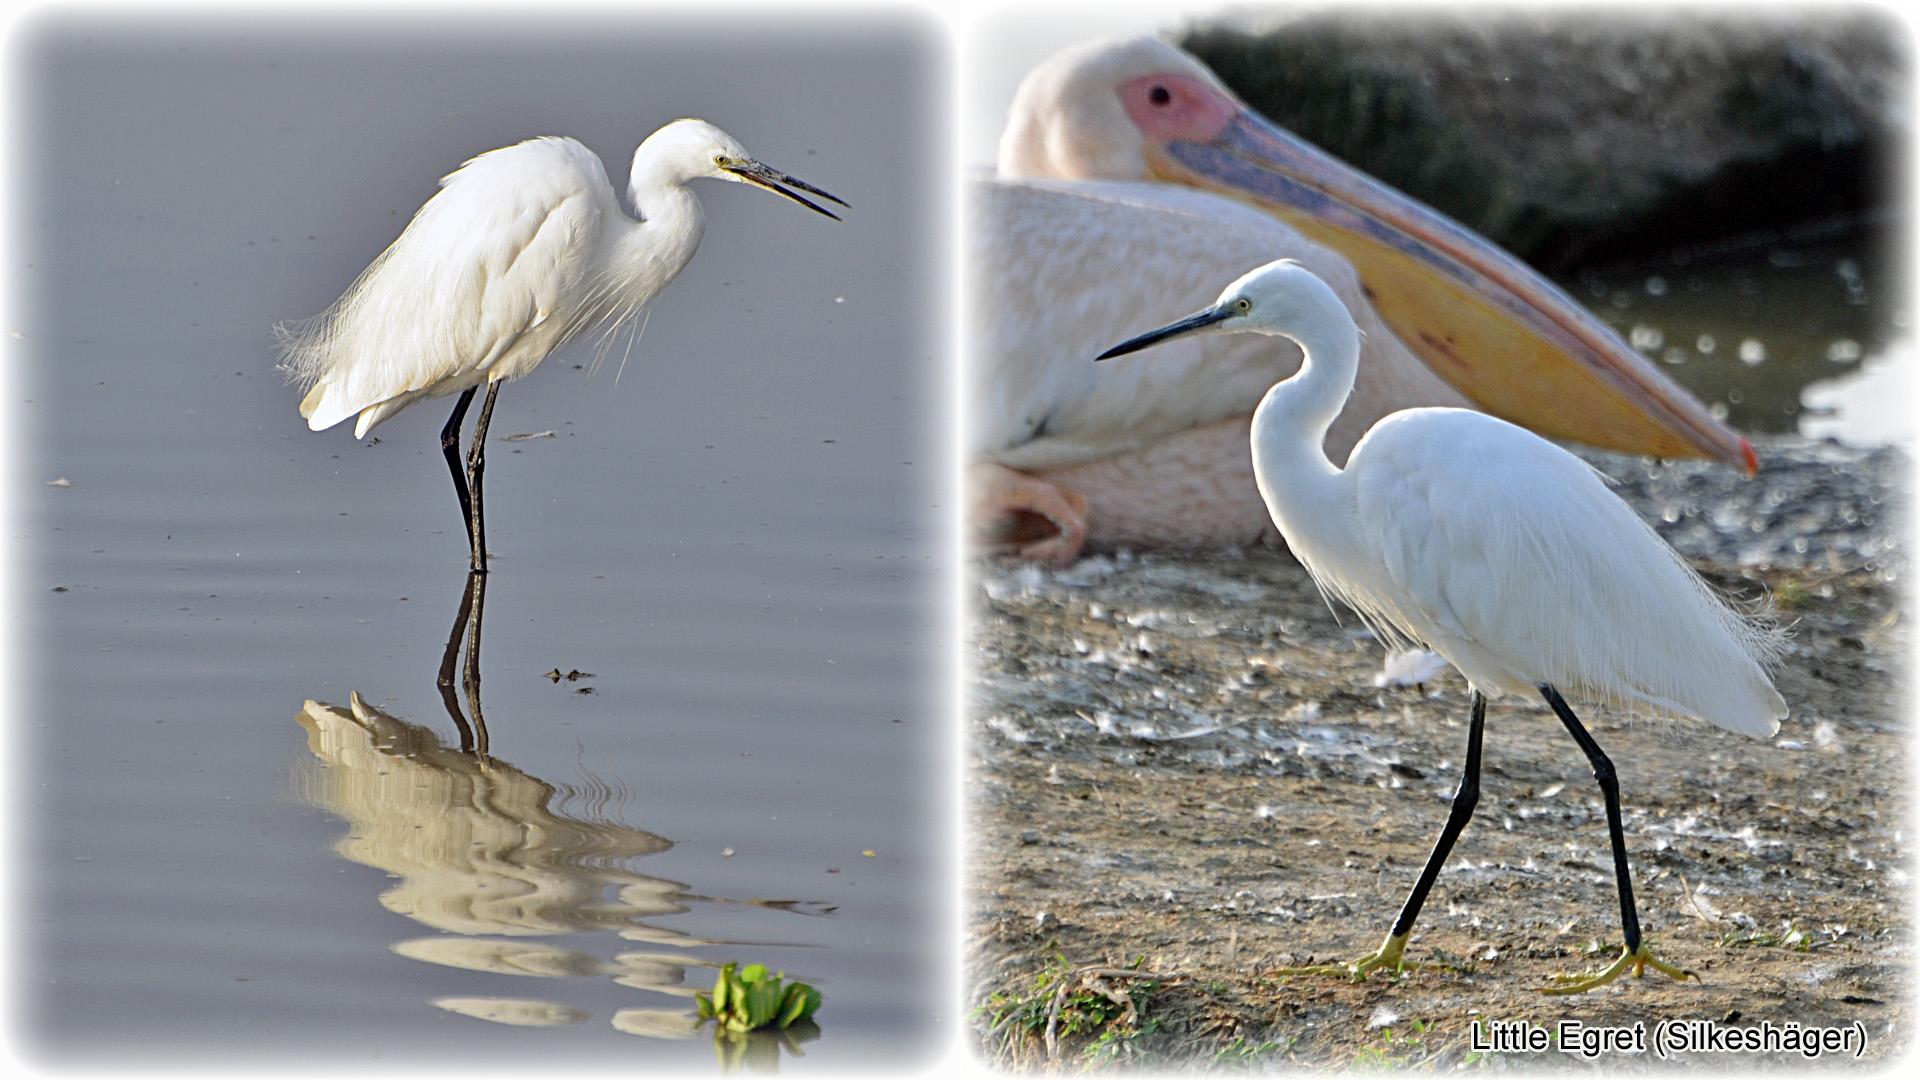 1f, Little Egret